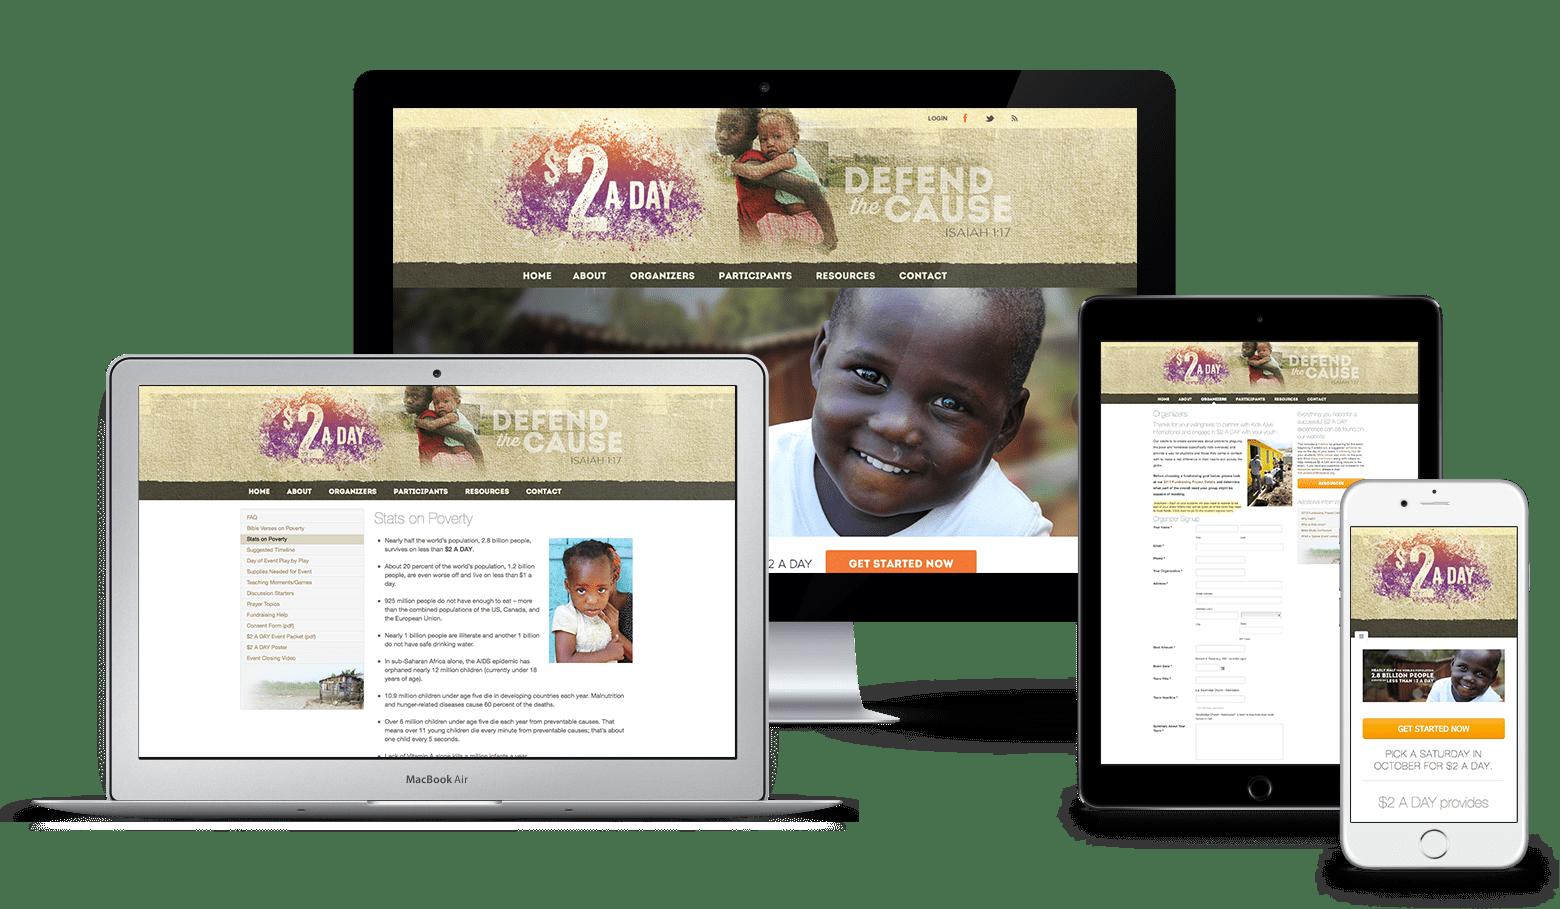 $2 A Day Website Design